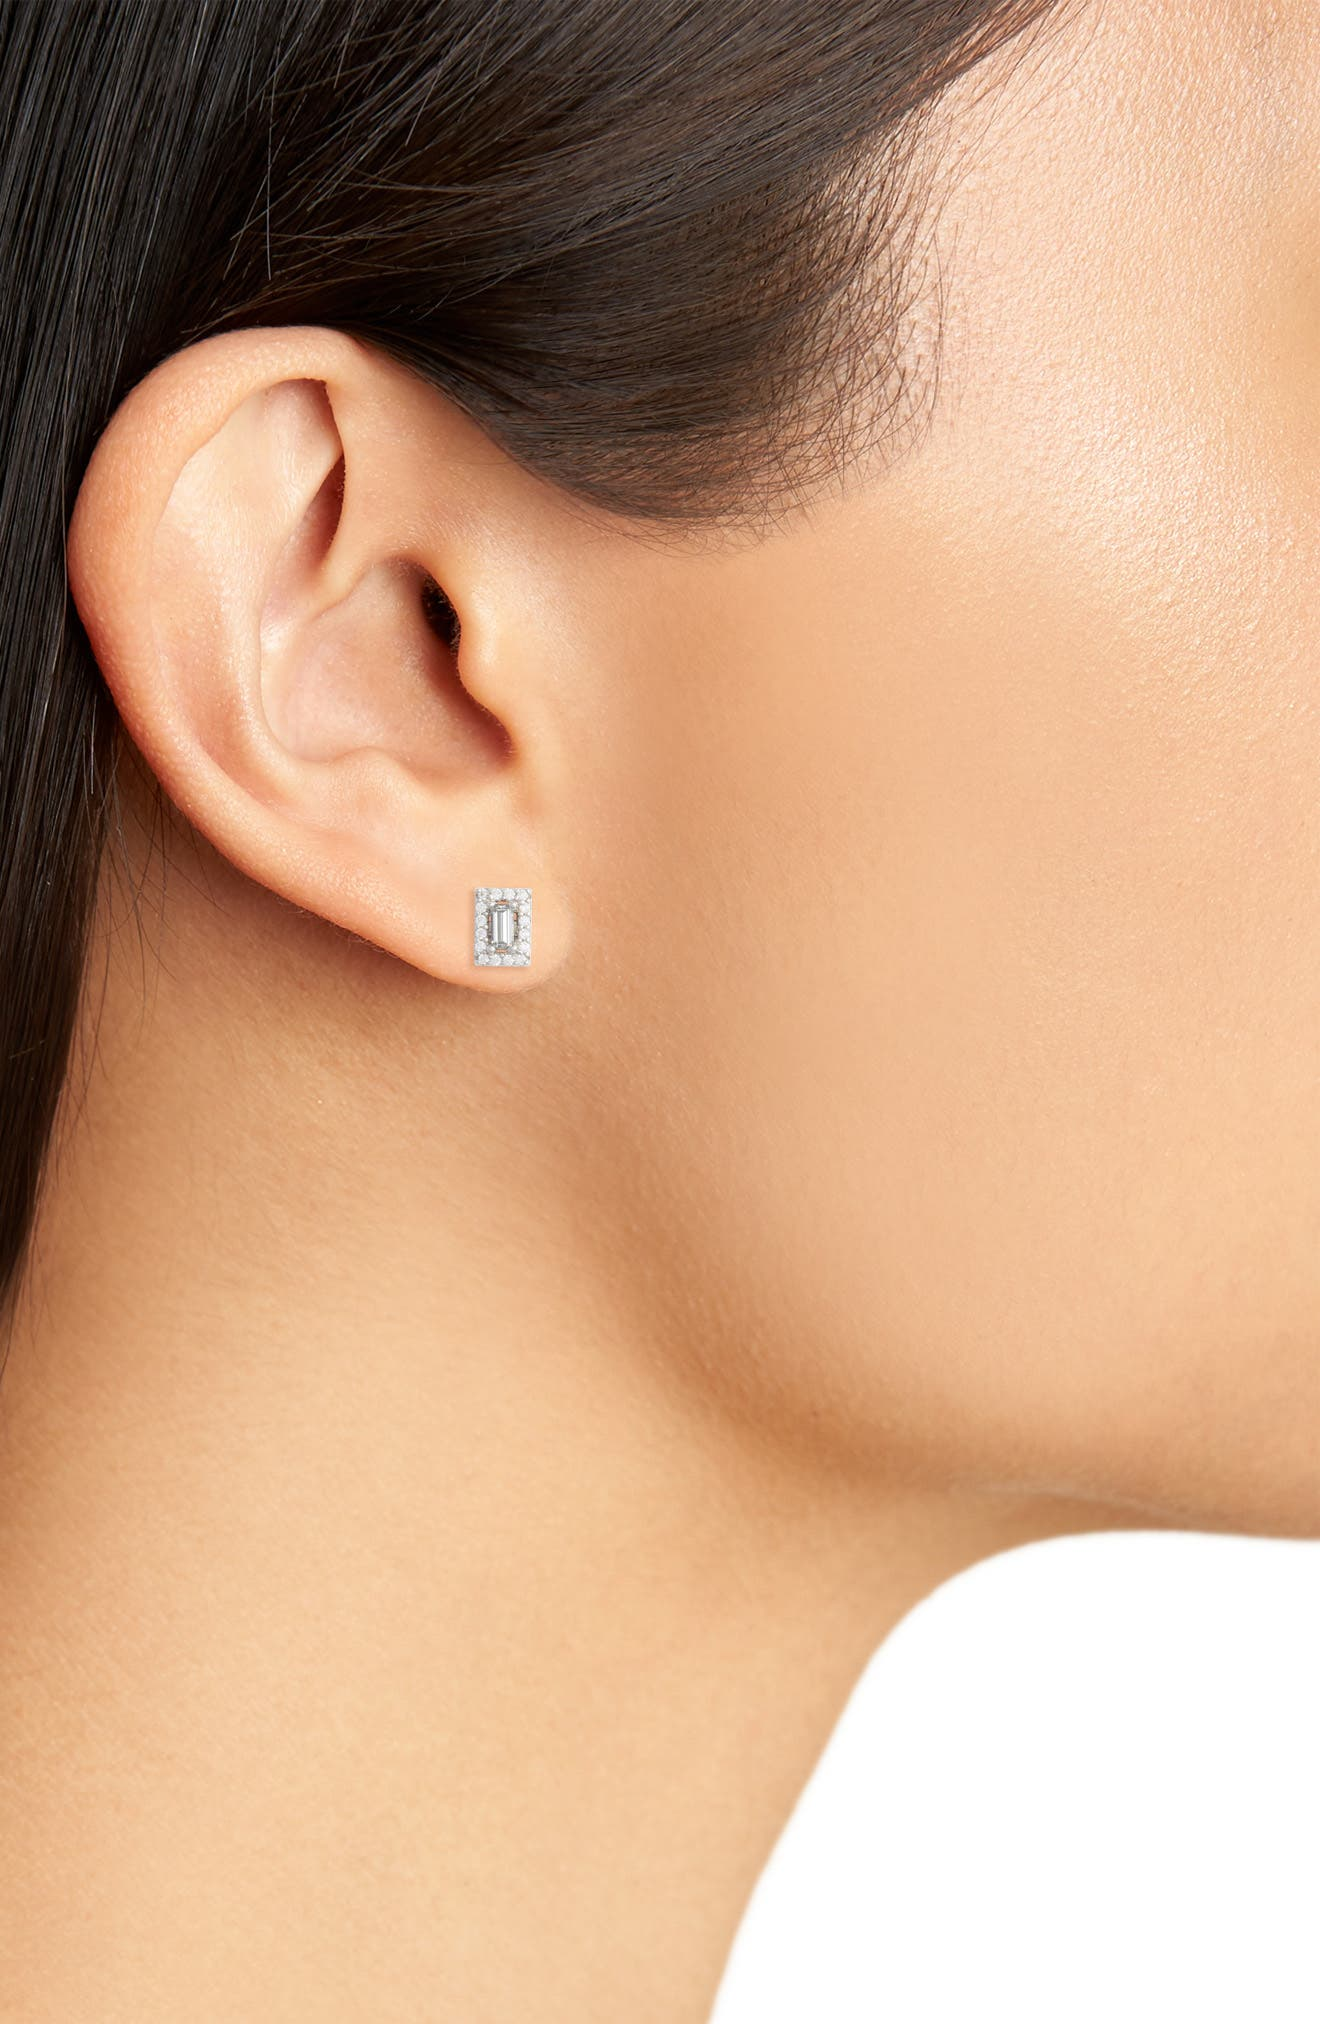 Crystal Baguette Simulated Diamond Stud Earrings,                             Alternate thumbnail 2, color,                             SILVER/ CLEAR